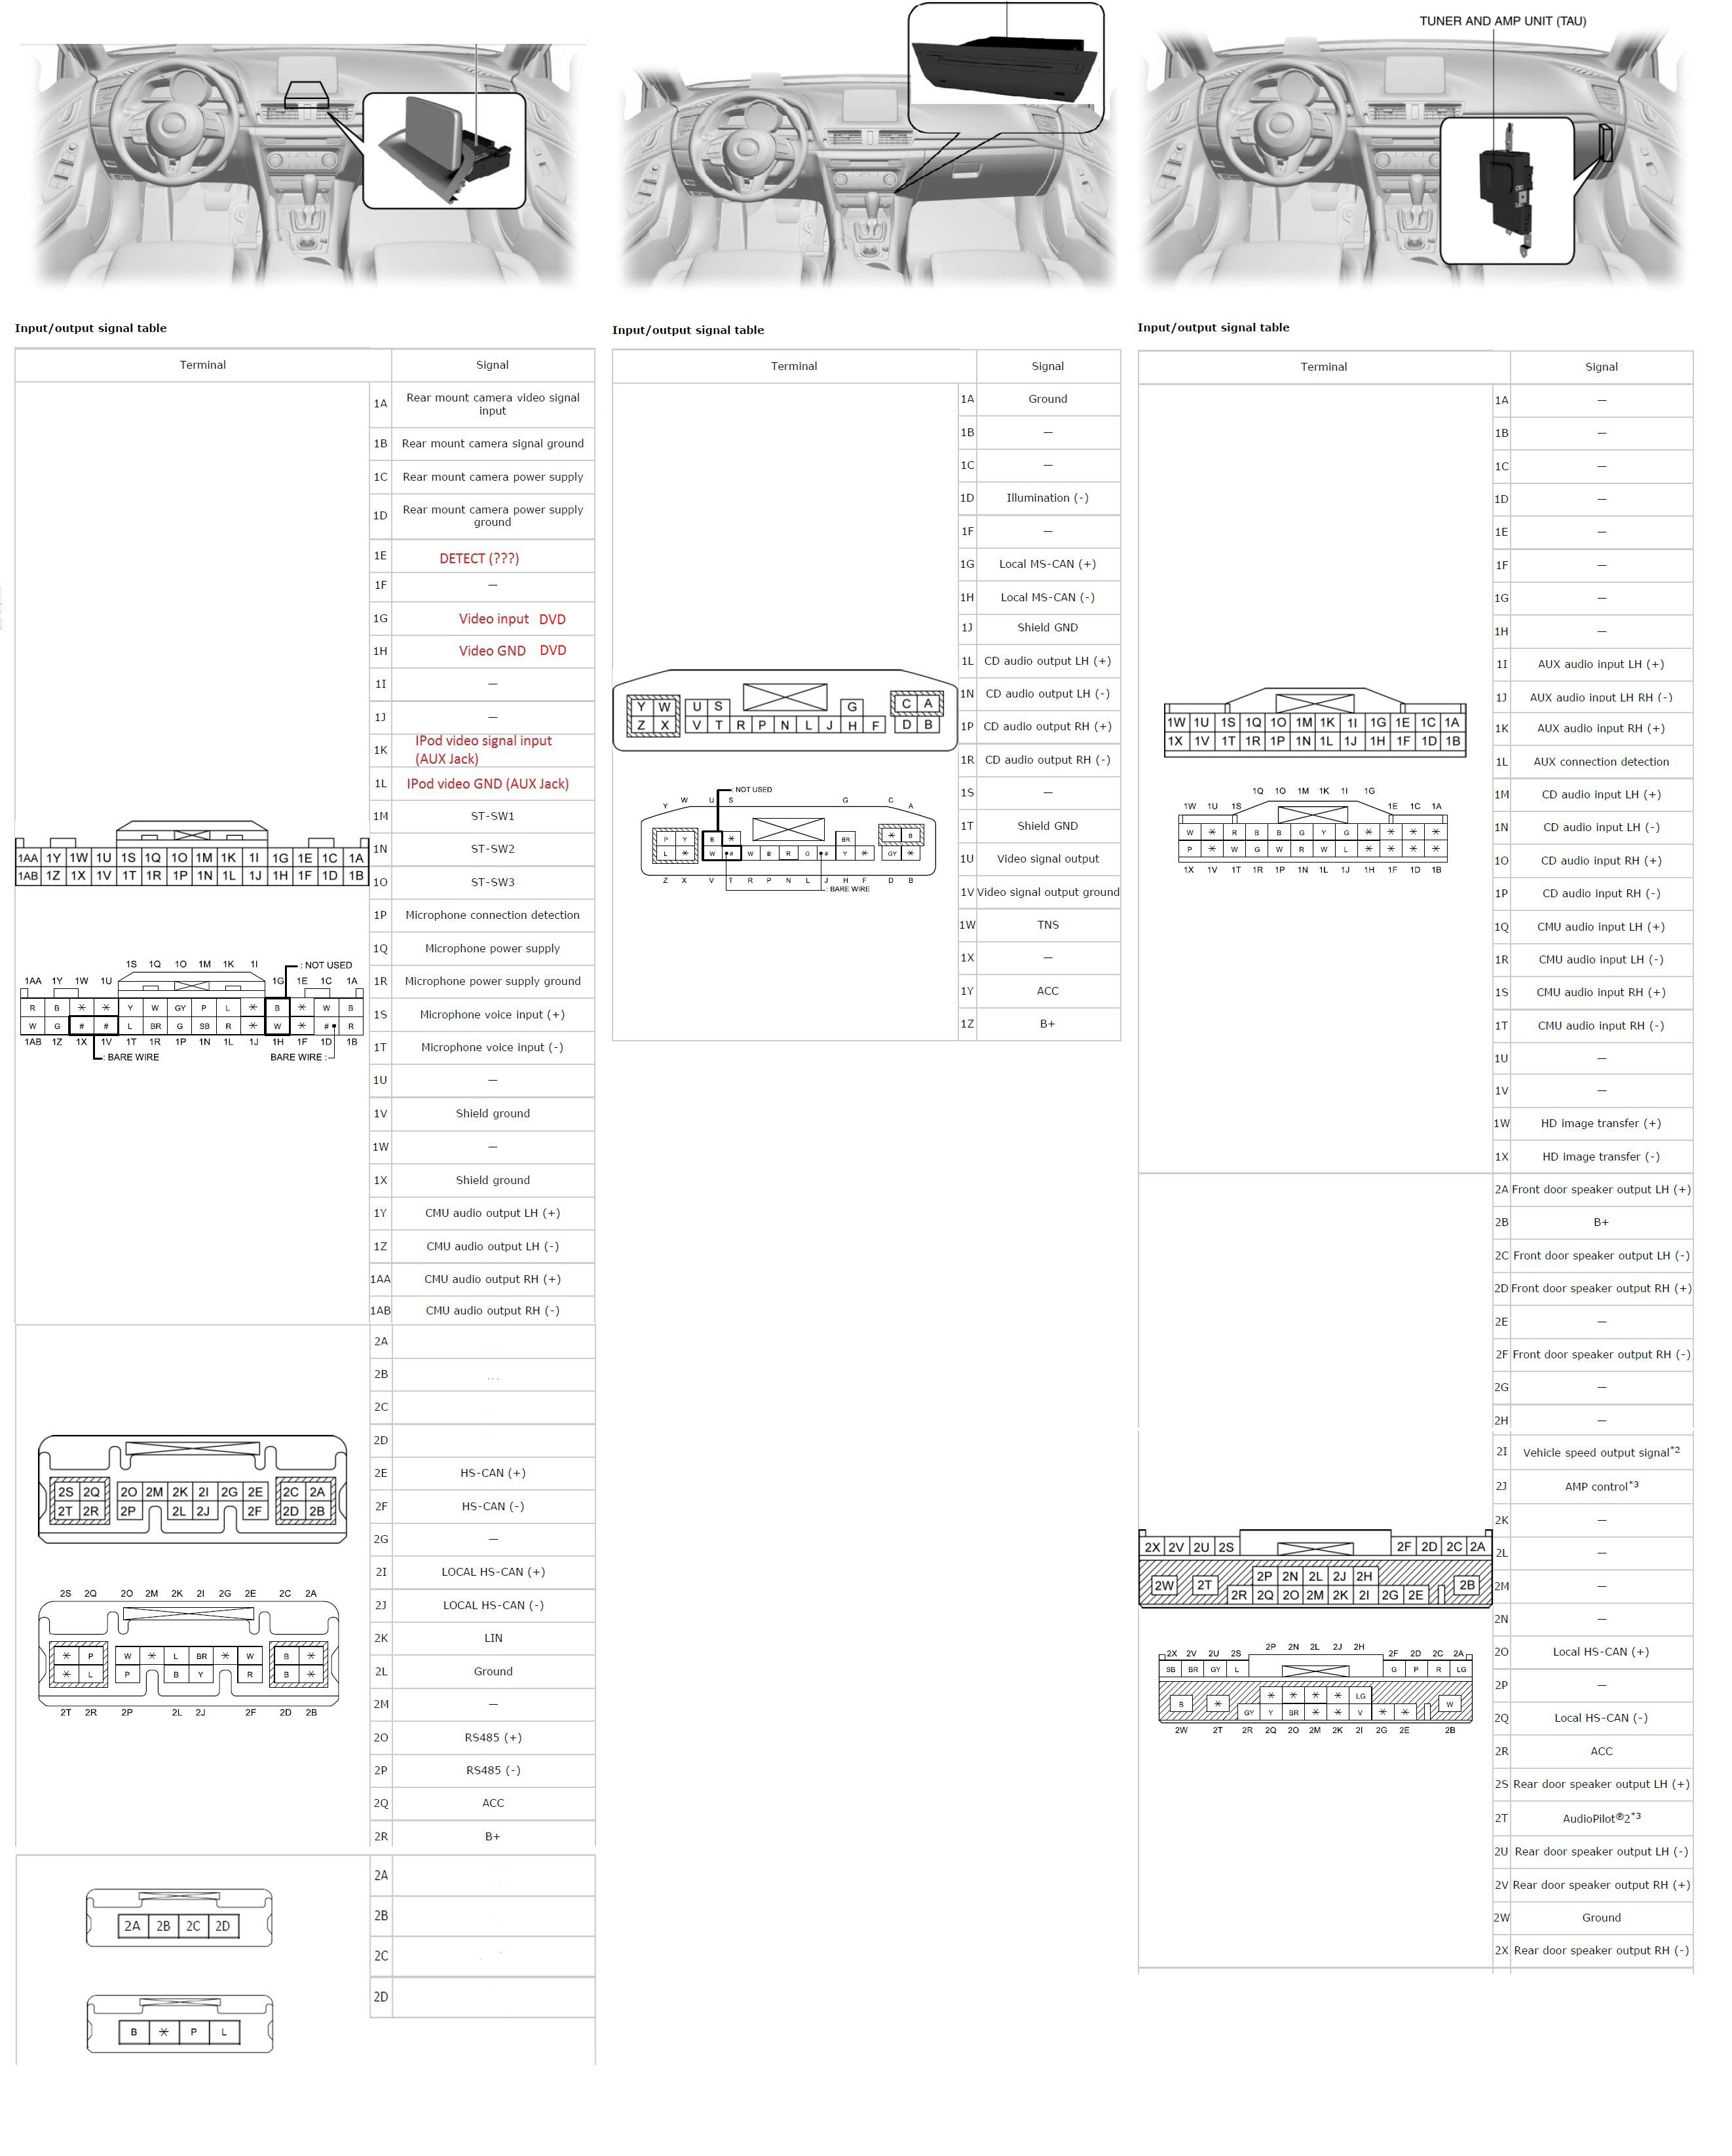 2017 Mazda 3 Wiring Diagram? | 2004 to 2020 Mazda 3 Forum and Mazdaspeed 3  ForumsMazda 3 Revolution